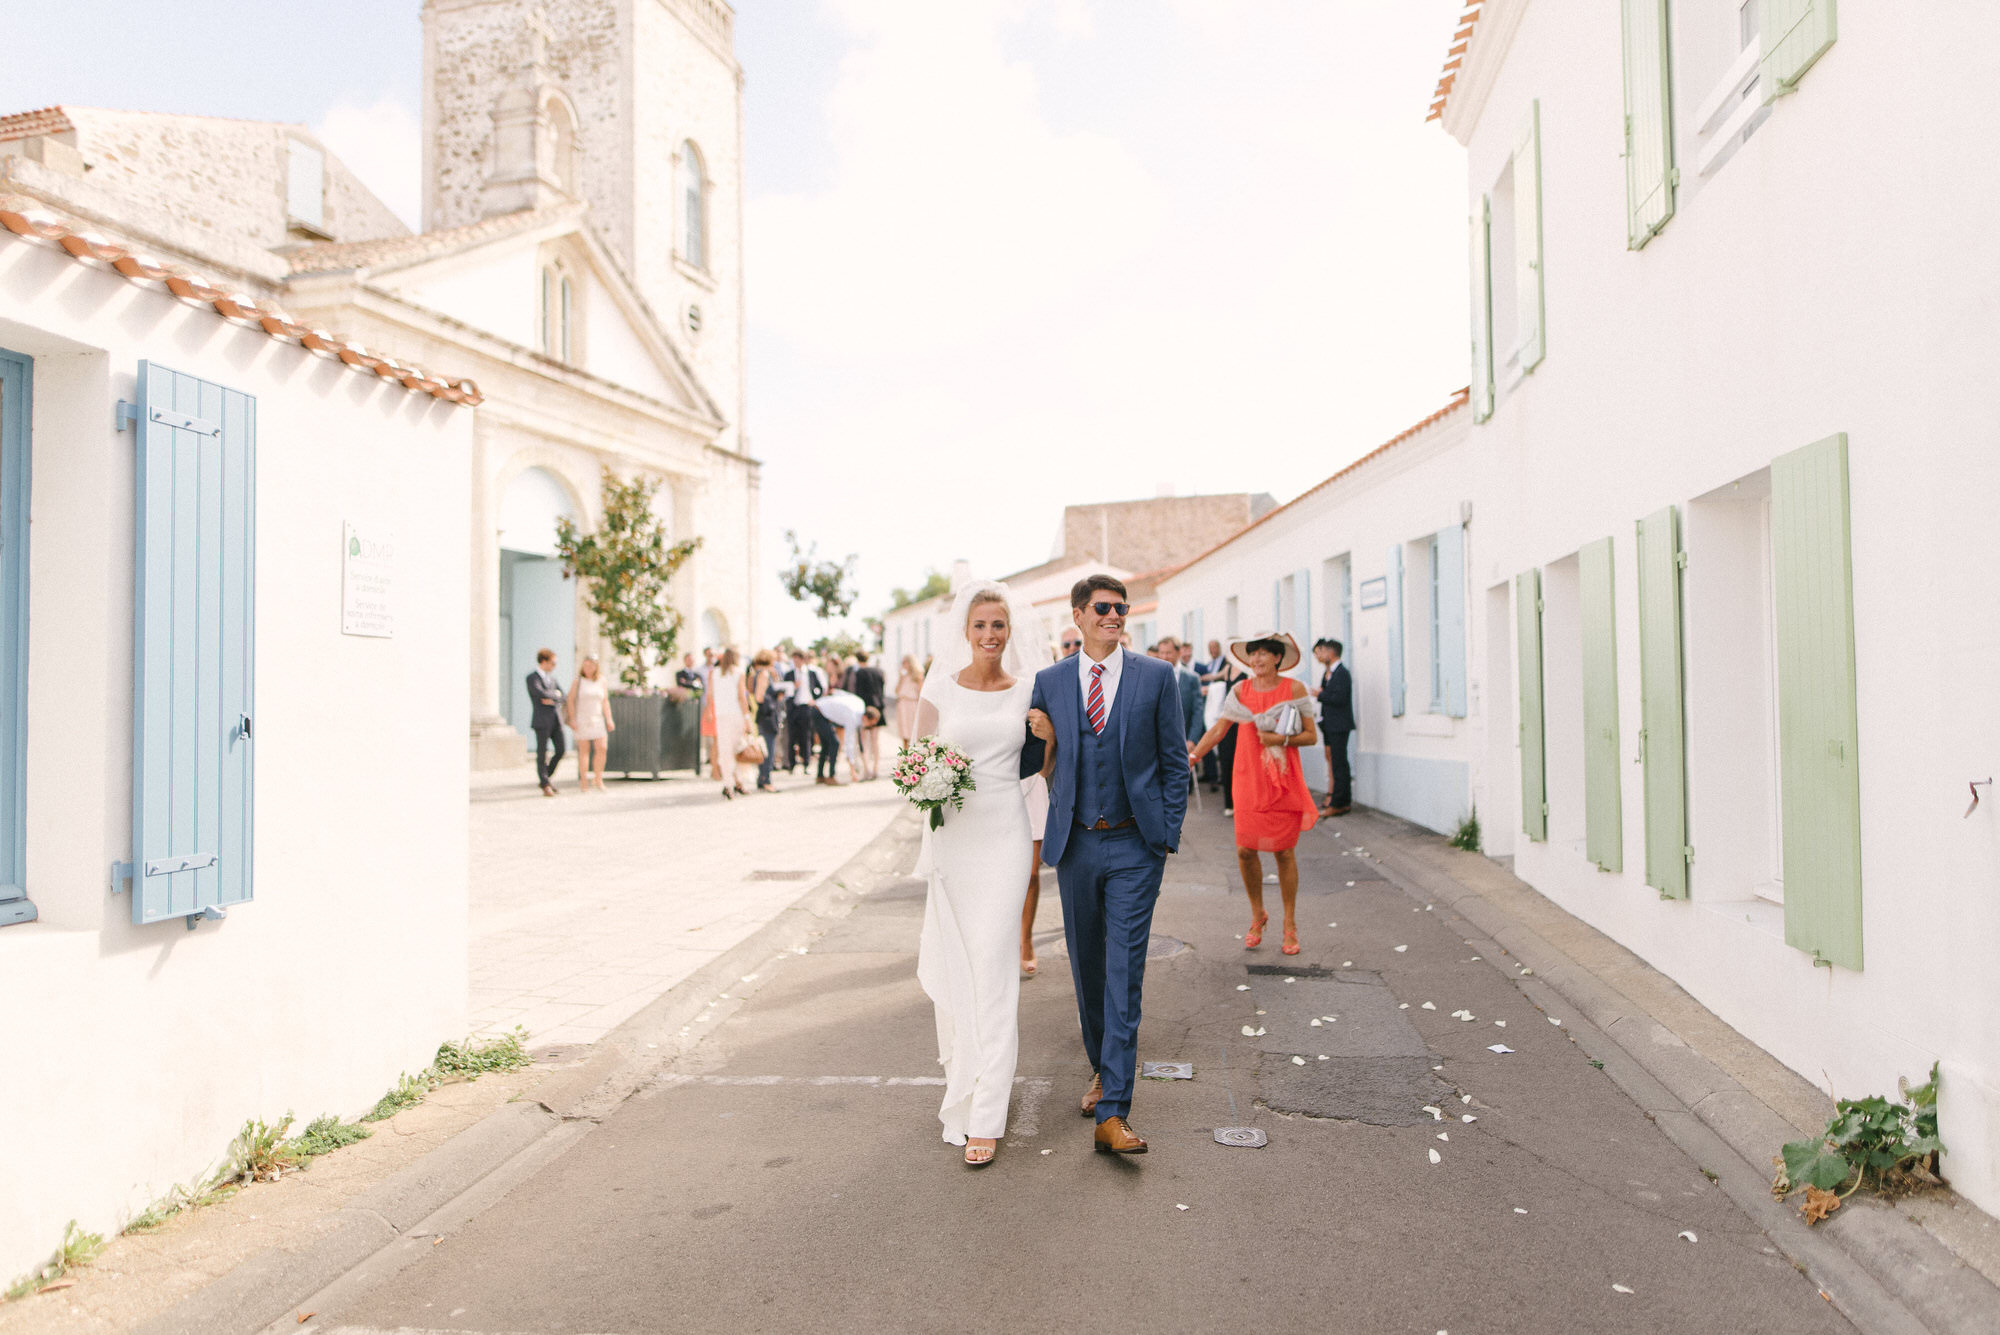 photographe-mariage-ile-d-yeu-00035